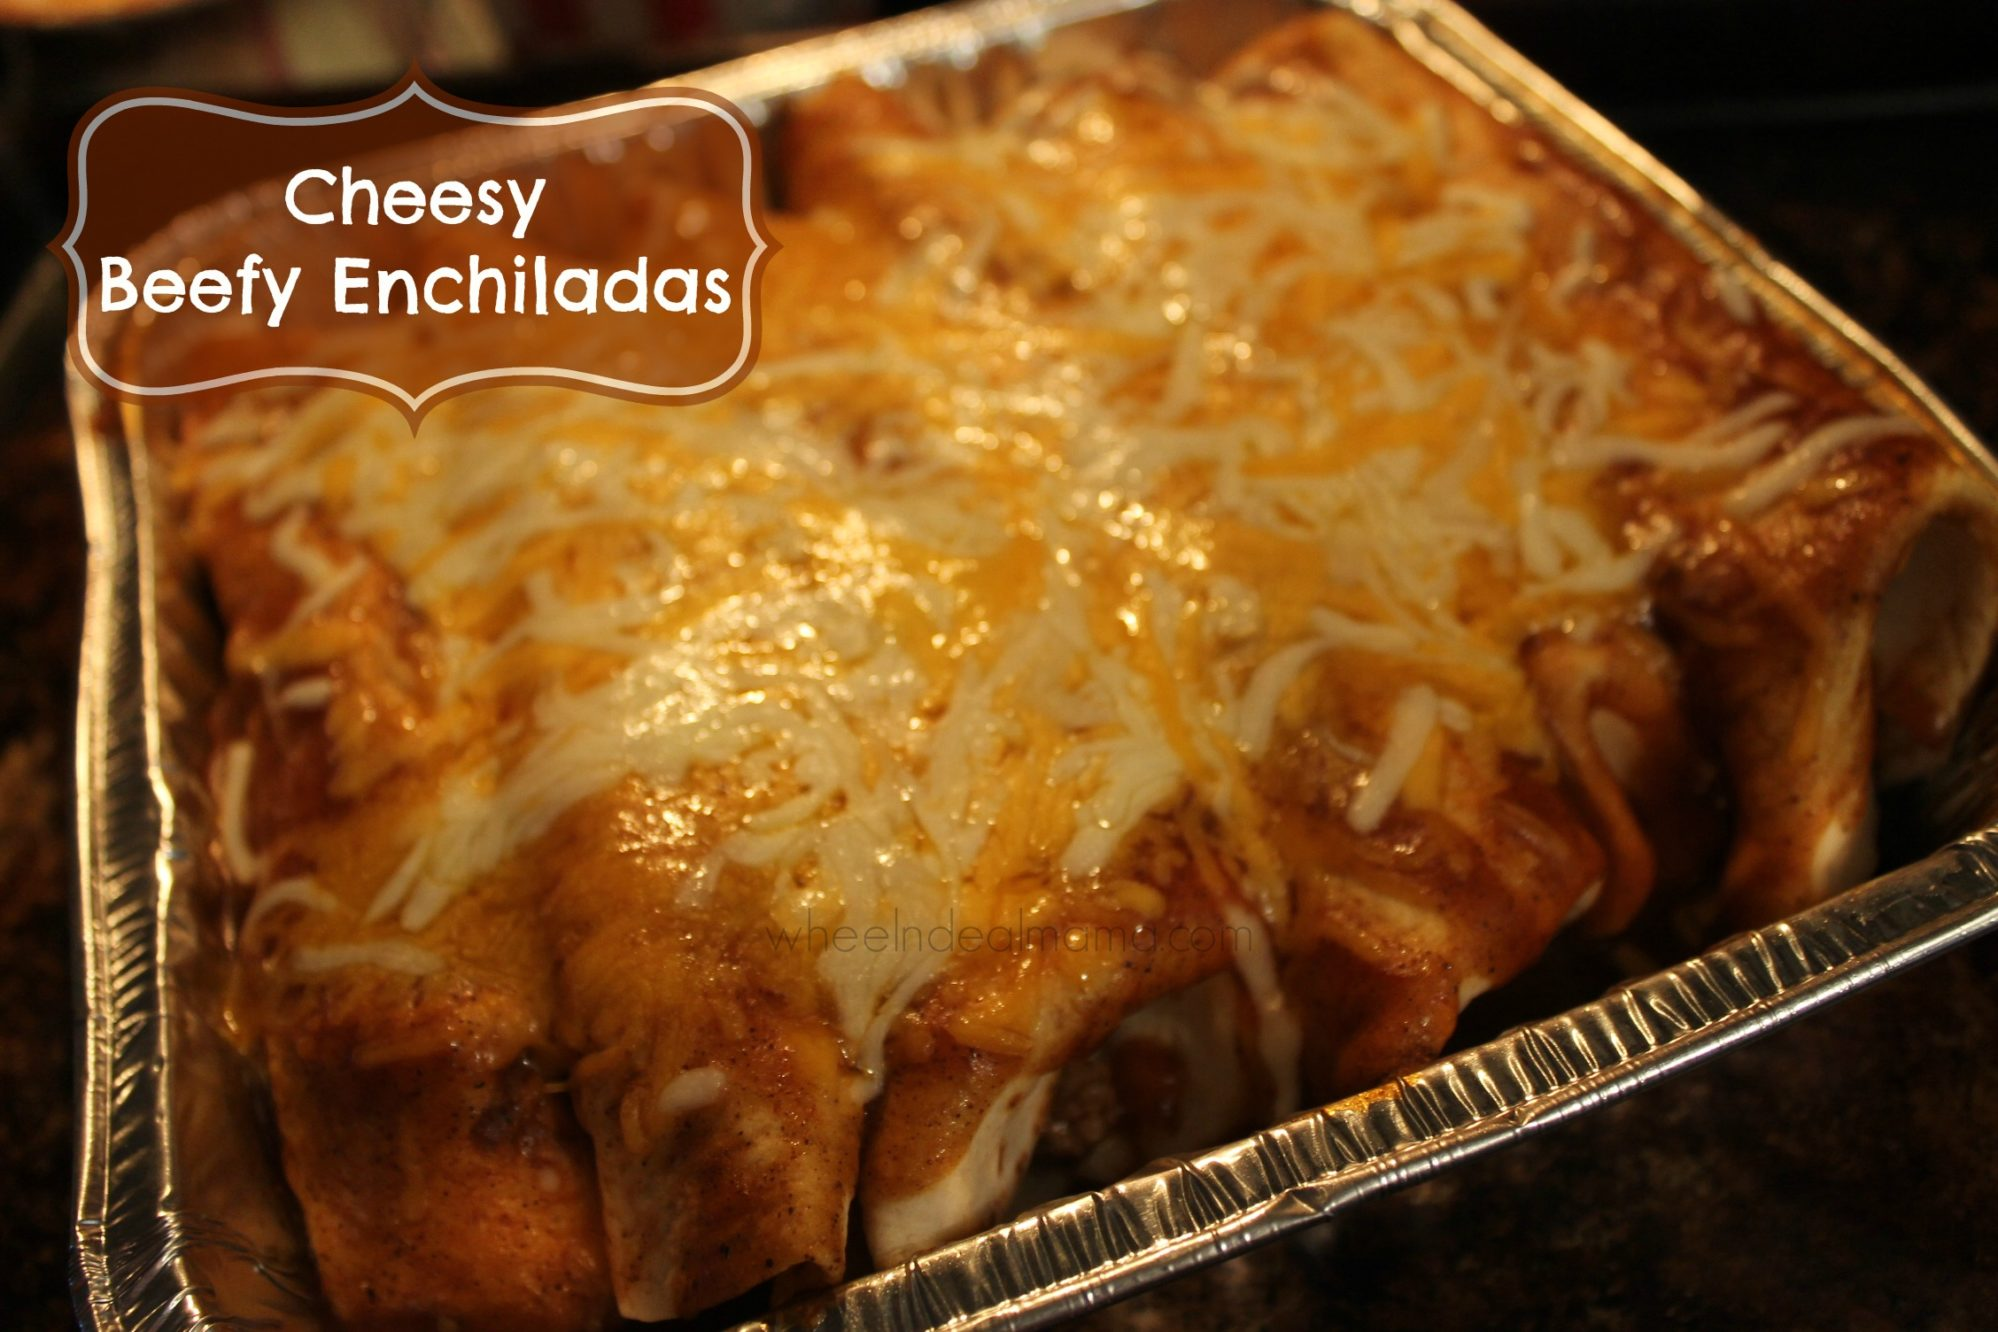 Cheesy Beefy Enchiladas; Easy Freezer Meal